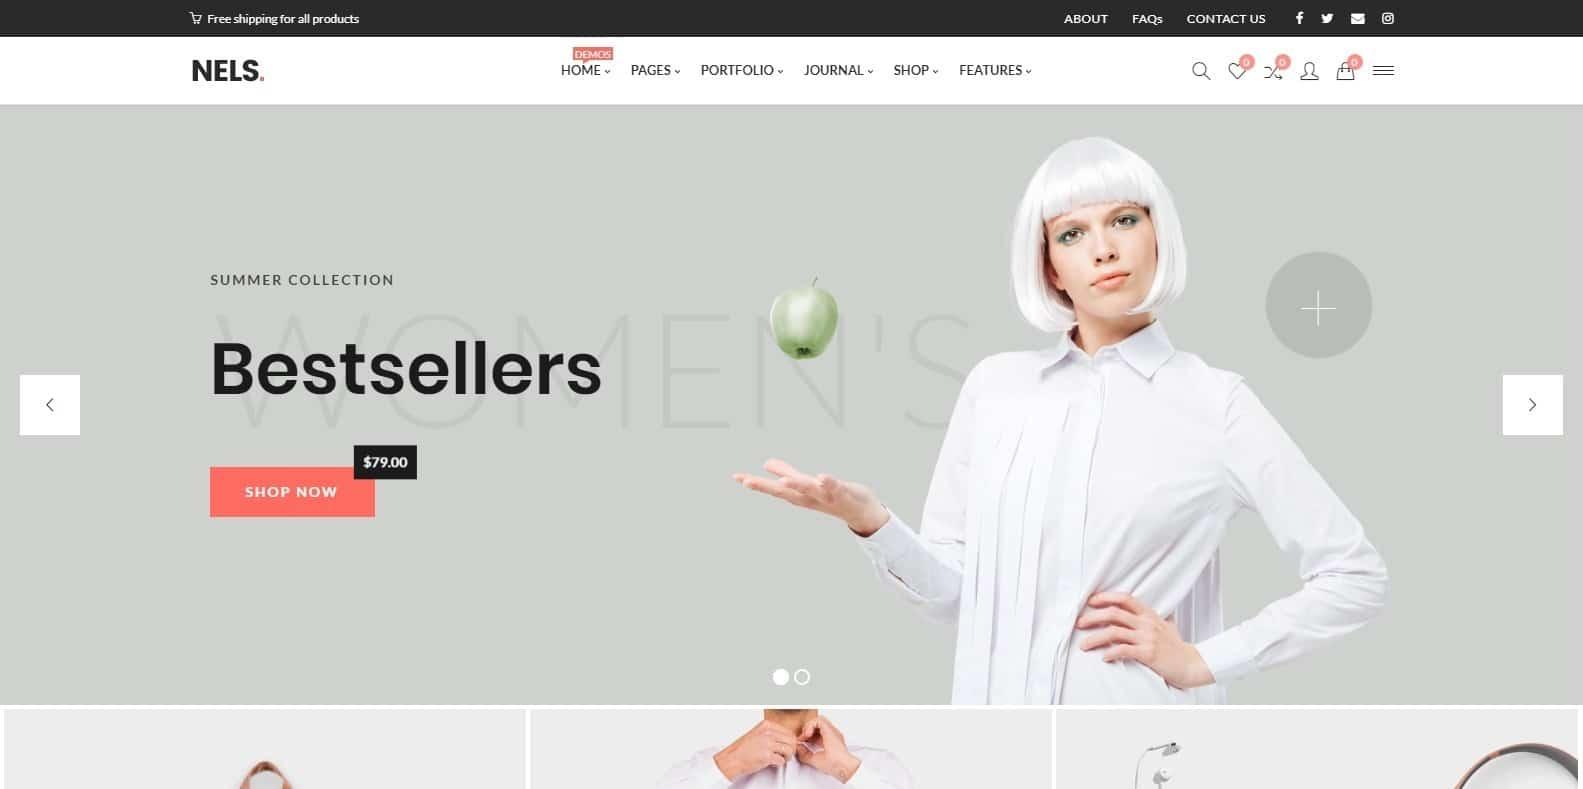 nels-html-bookstore-website-template